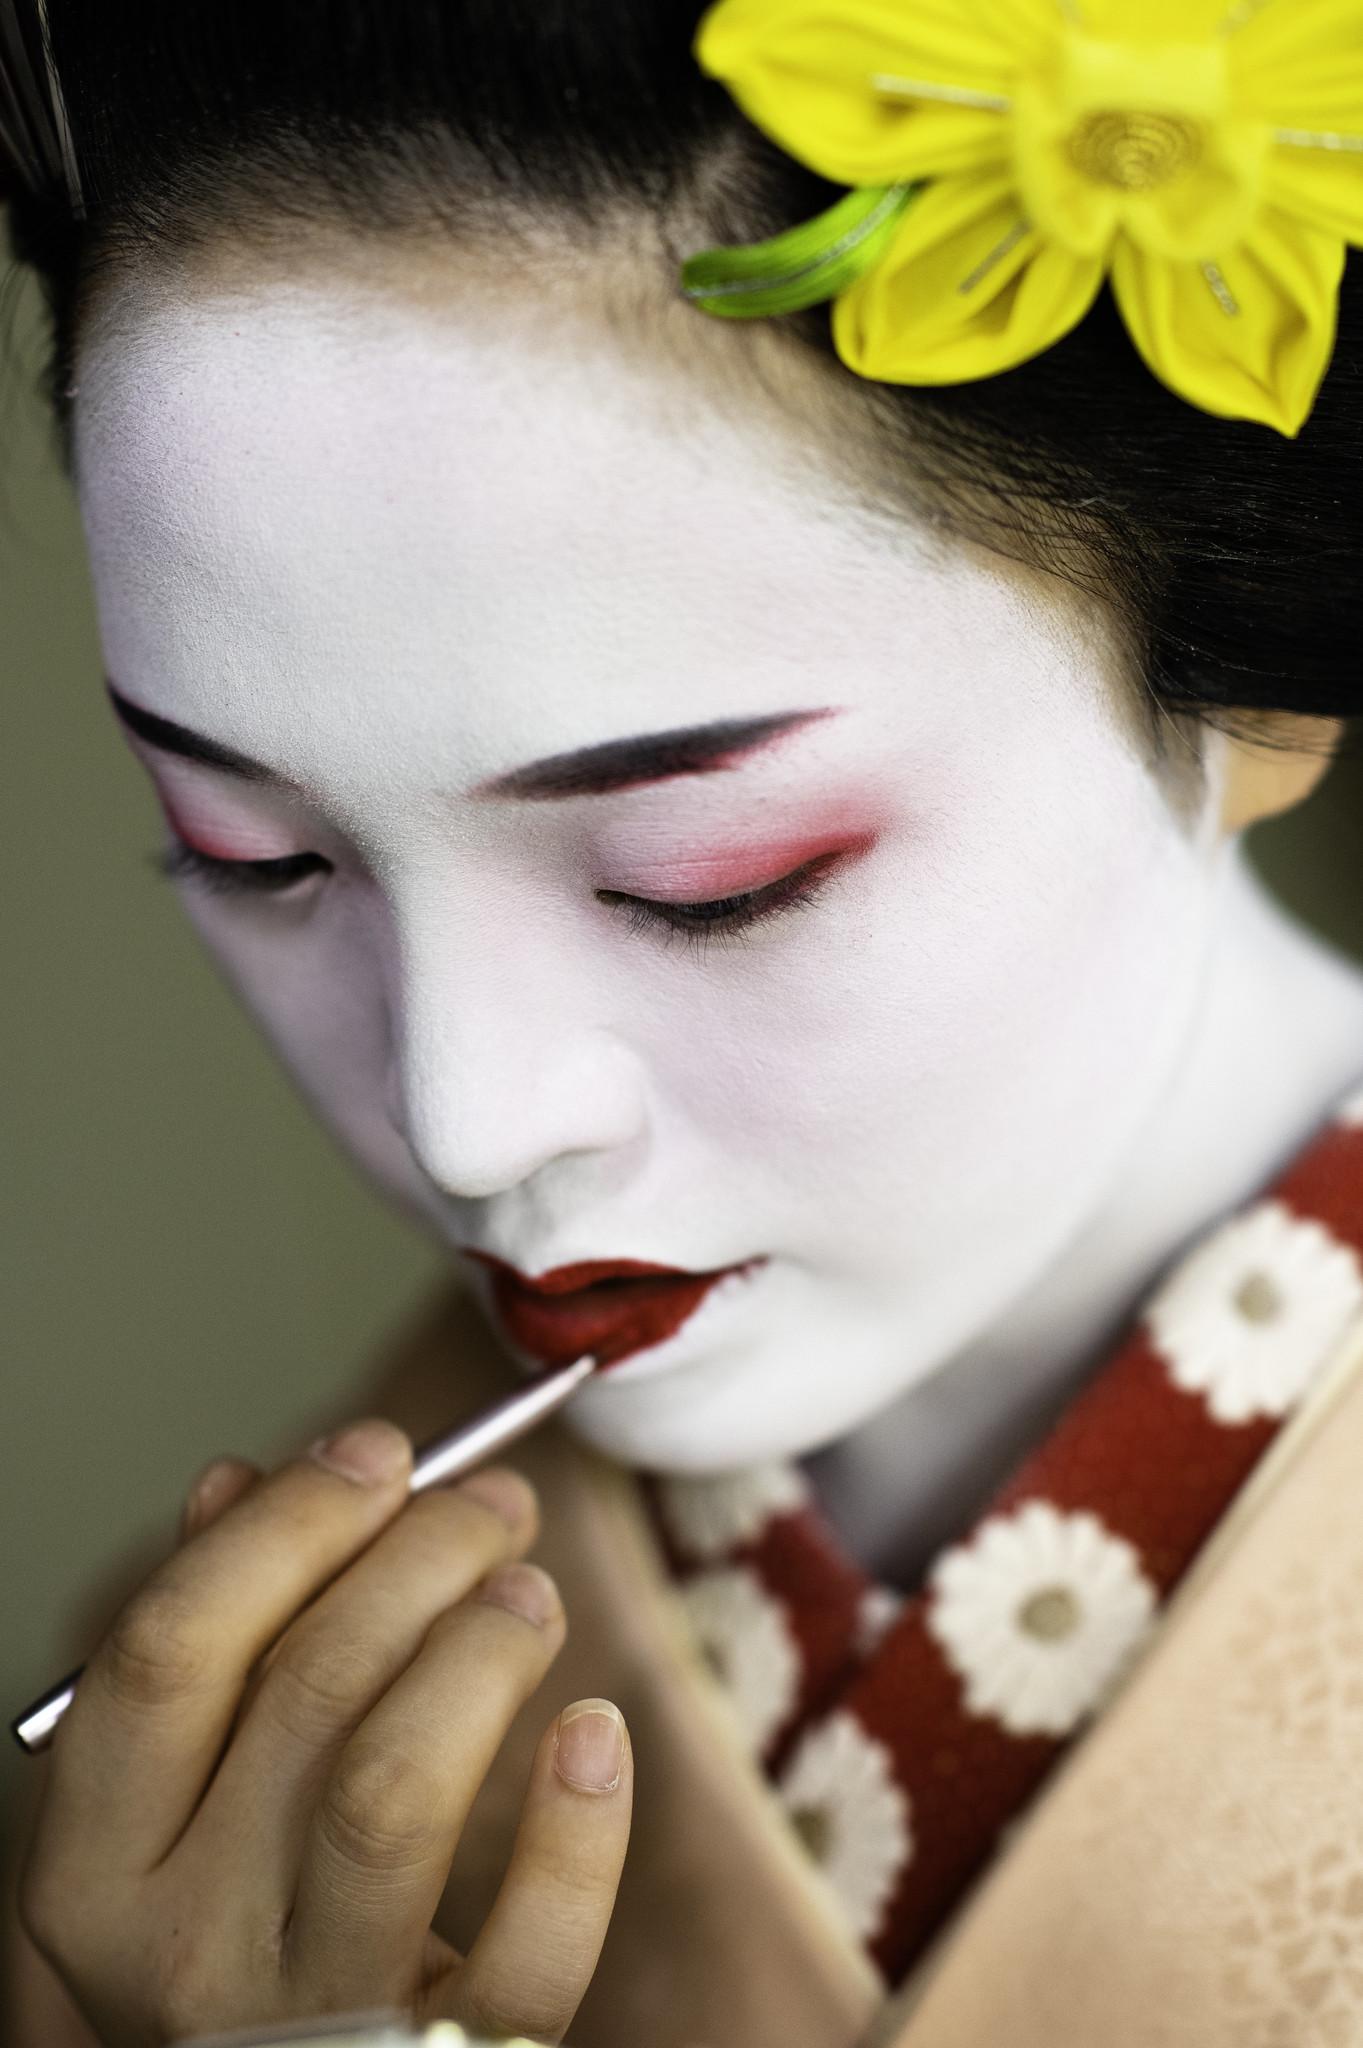 Red Lipstick - Maiko (Japan)